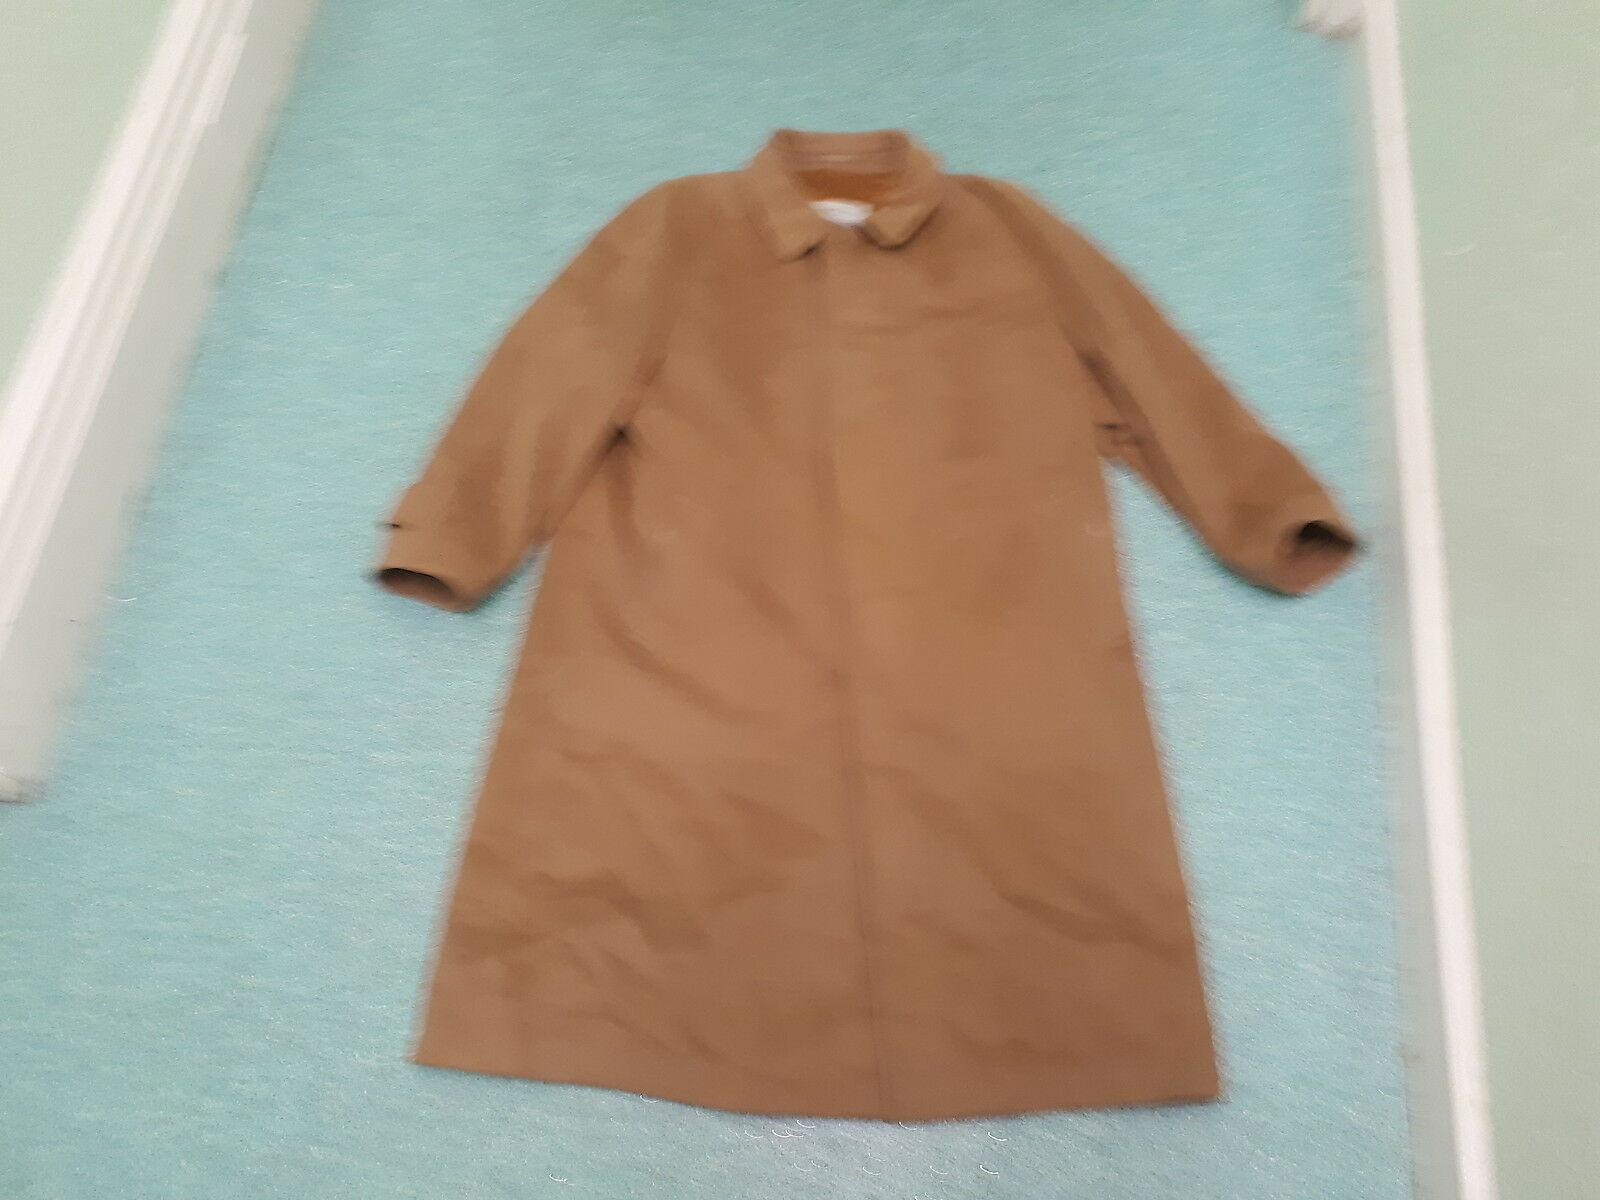 Aquascutum Mens 48 Inch Chest 44 Inch Length Pure Cashmere Overcoat